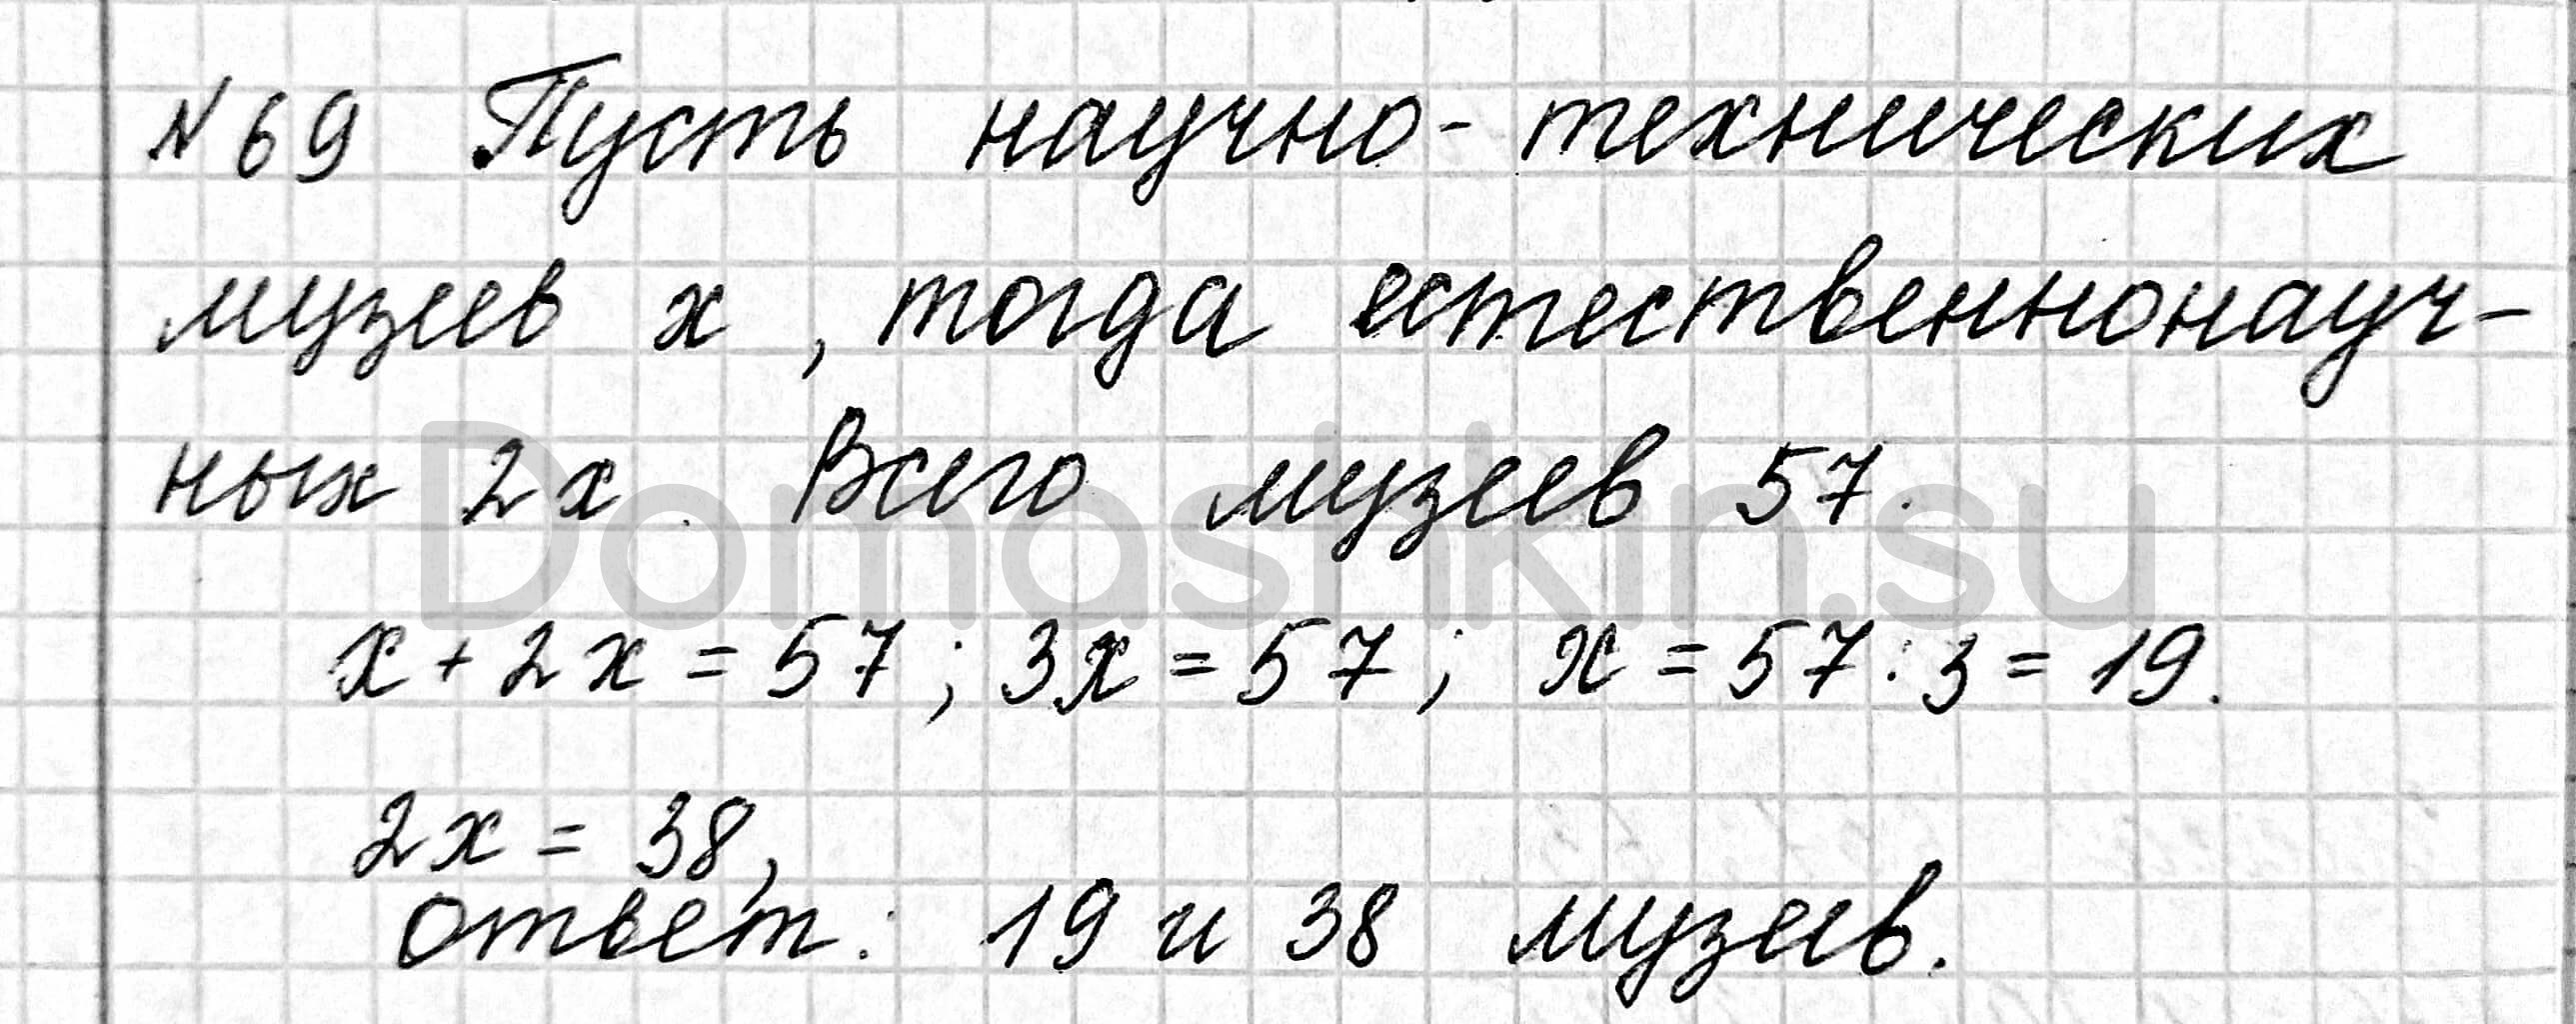 Математика 6 класс учебник Мерзляк номер 69 решение